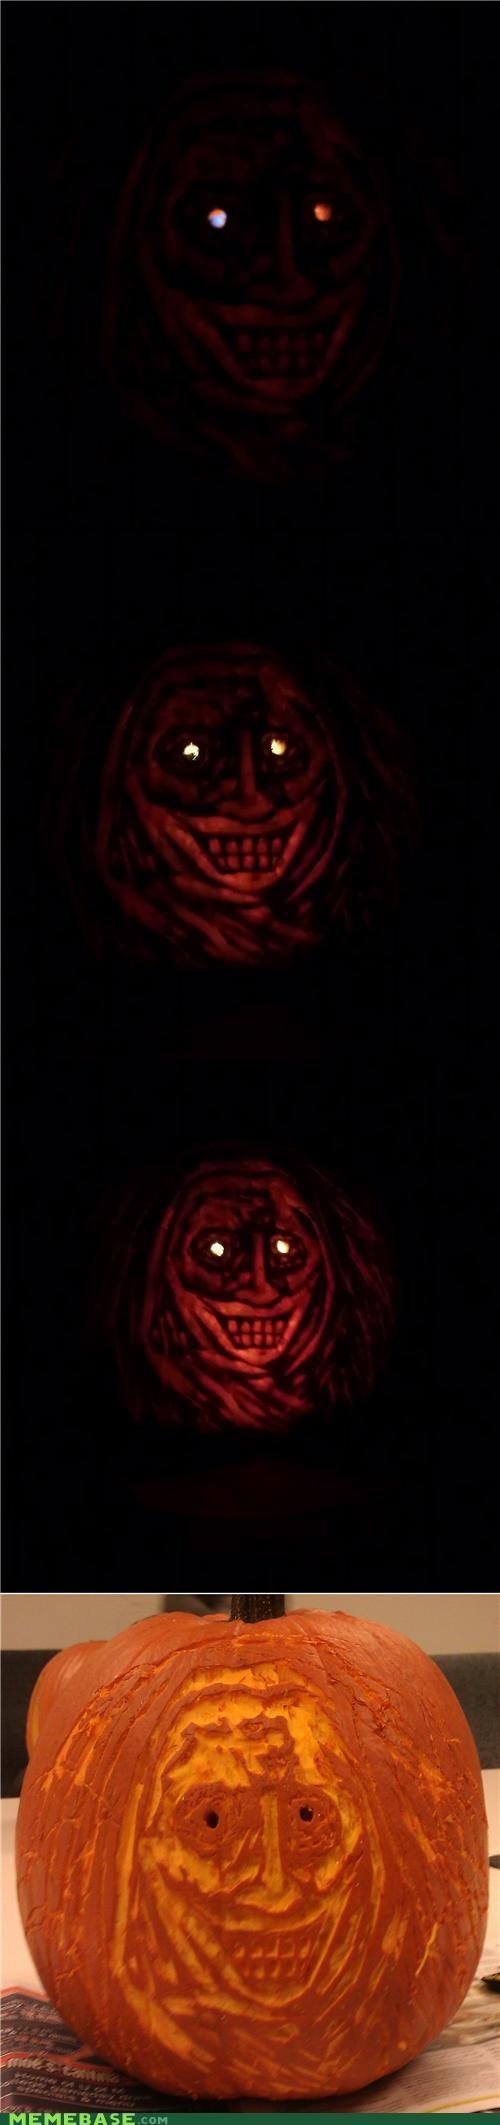 brightness carve IRL pumpkins The Shadowlurker - 5359712768